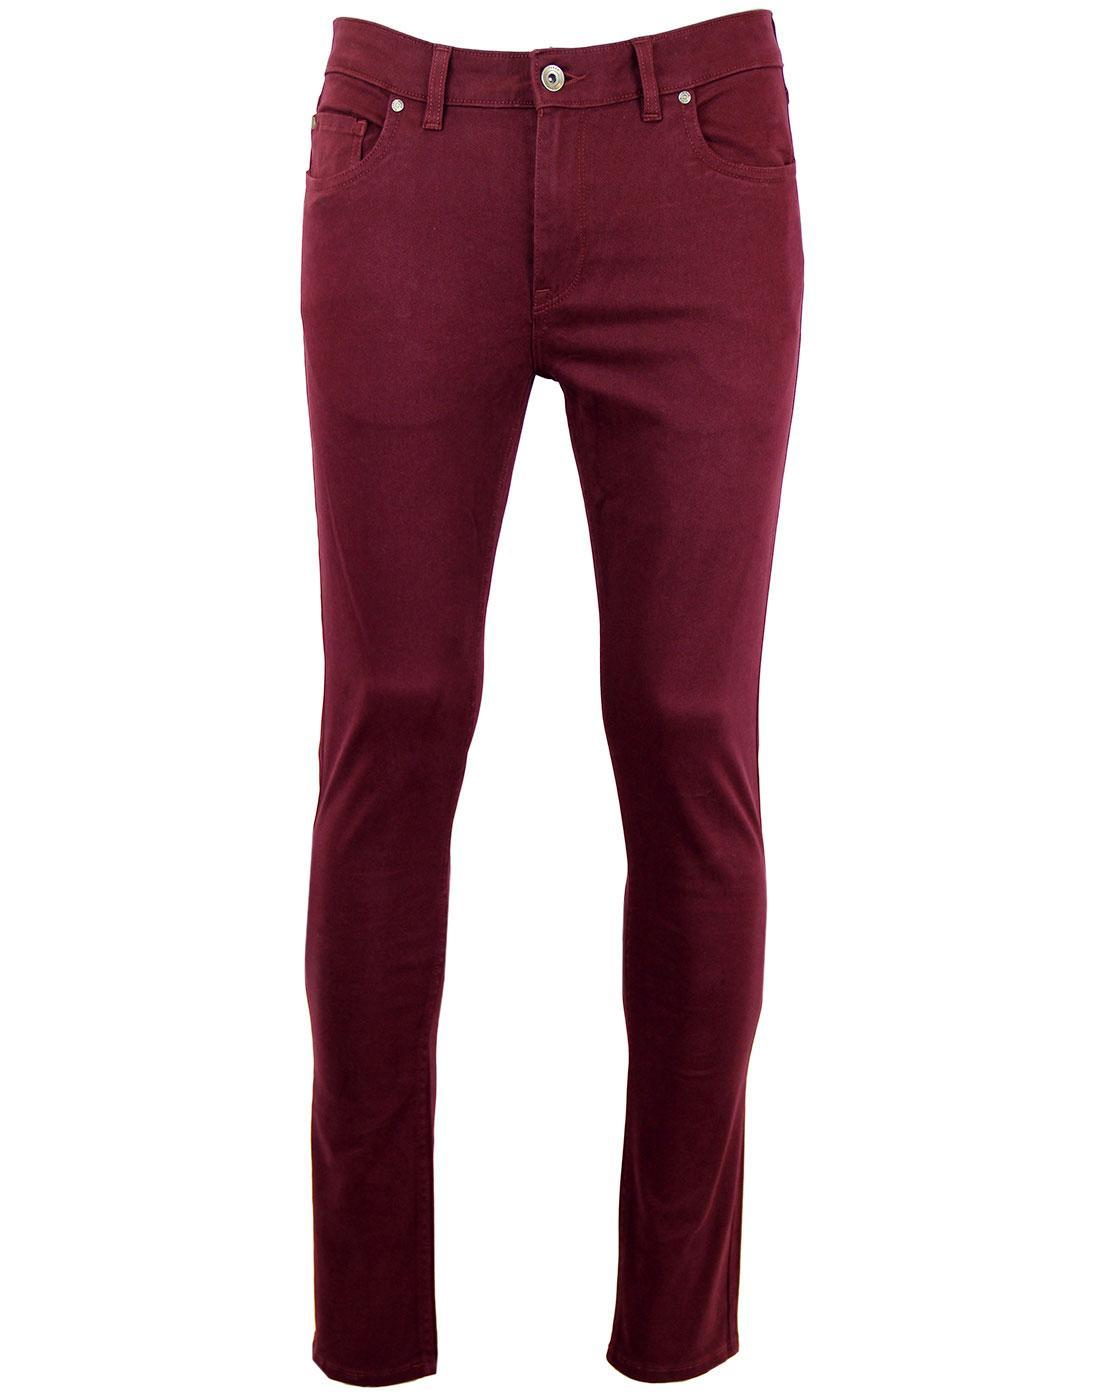 Drake FARAH VINTAGE Twill Slim Trousers (B)